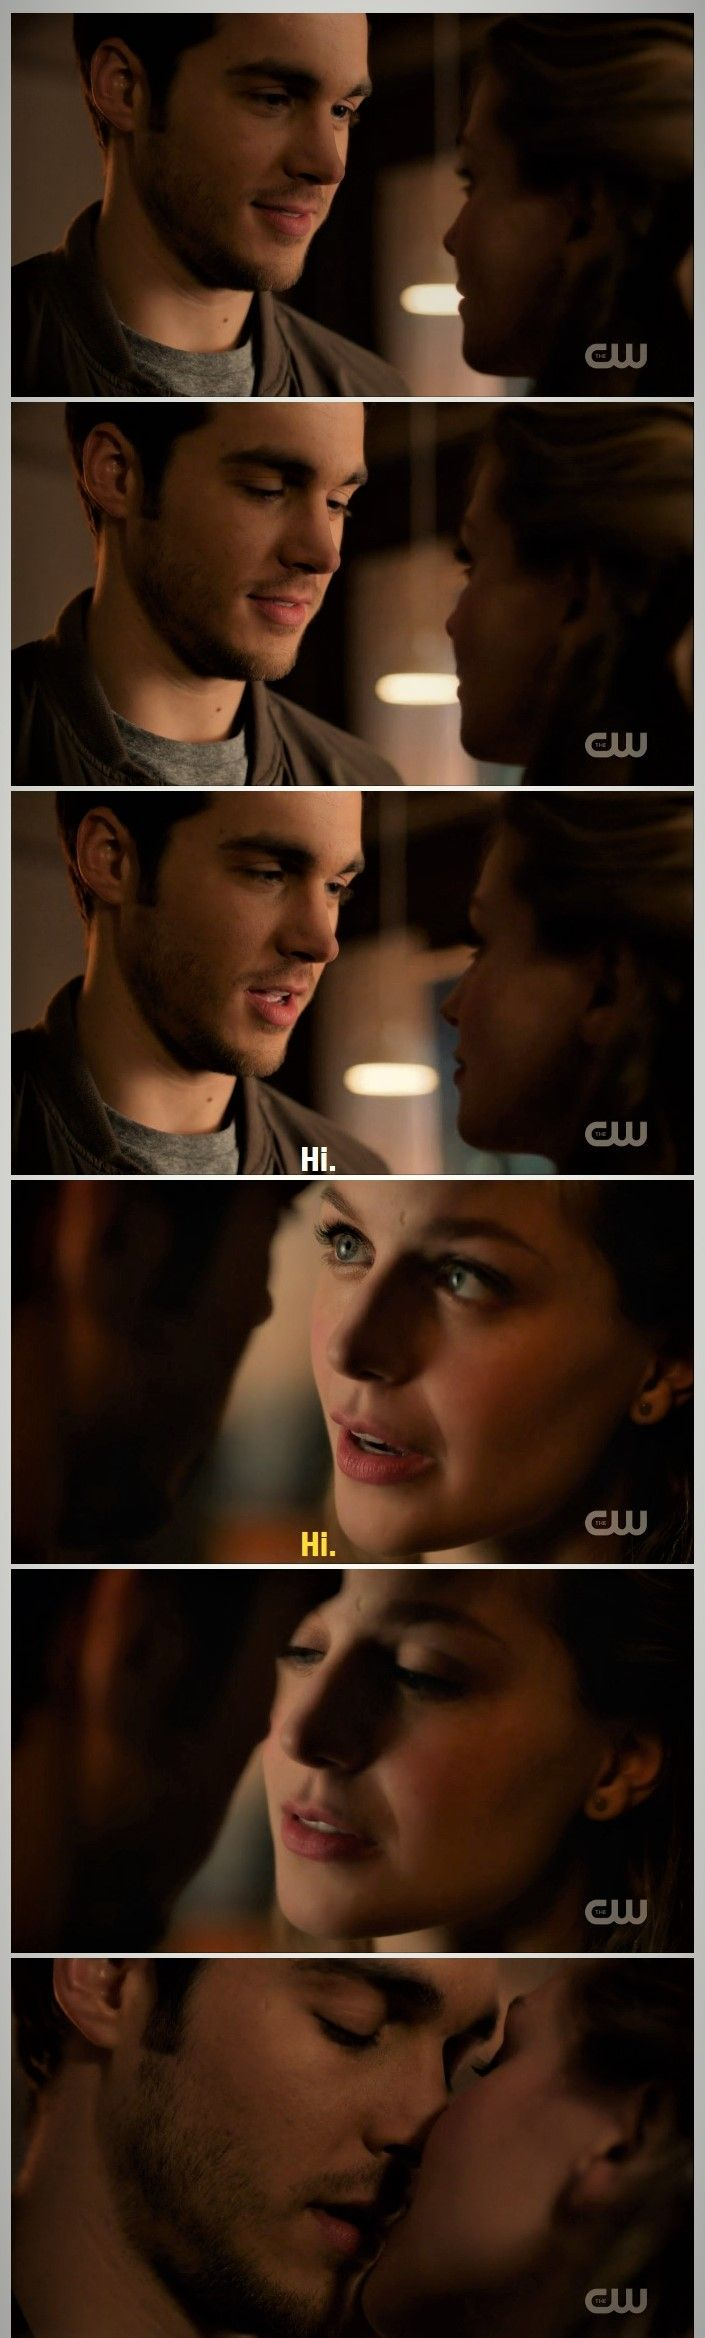 "Oh, the Almost-Kiss. So not fair. But Kara and Mon-El have the cutest dumbstruck looks, (and the dorkiest ""Hi""s) so whatever. It's all good <3 |TV Shows||CW||#Supergirl edit||Season 2||2x12||""Luthors""||Kara x Mon-El||#Karamel edit||Kara Danvers||Melissa Benoist||Chris Wood||#DCTV|"